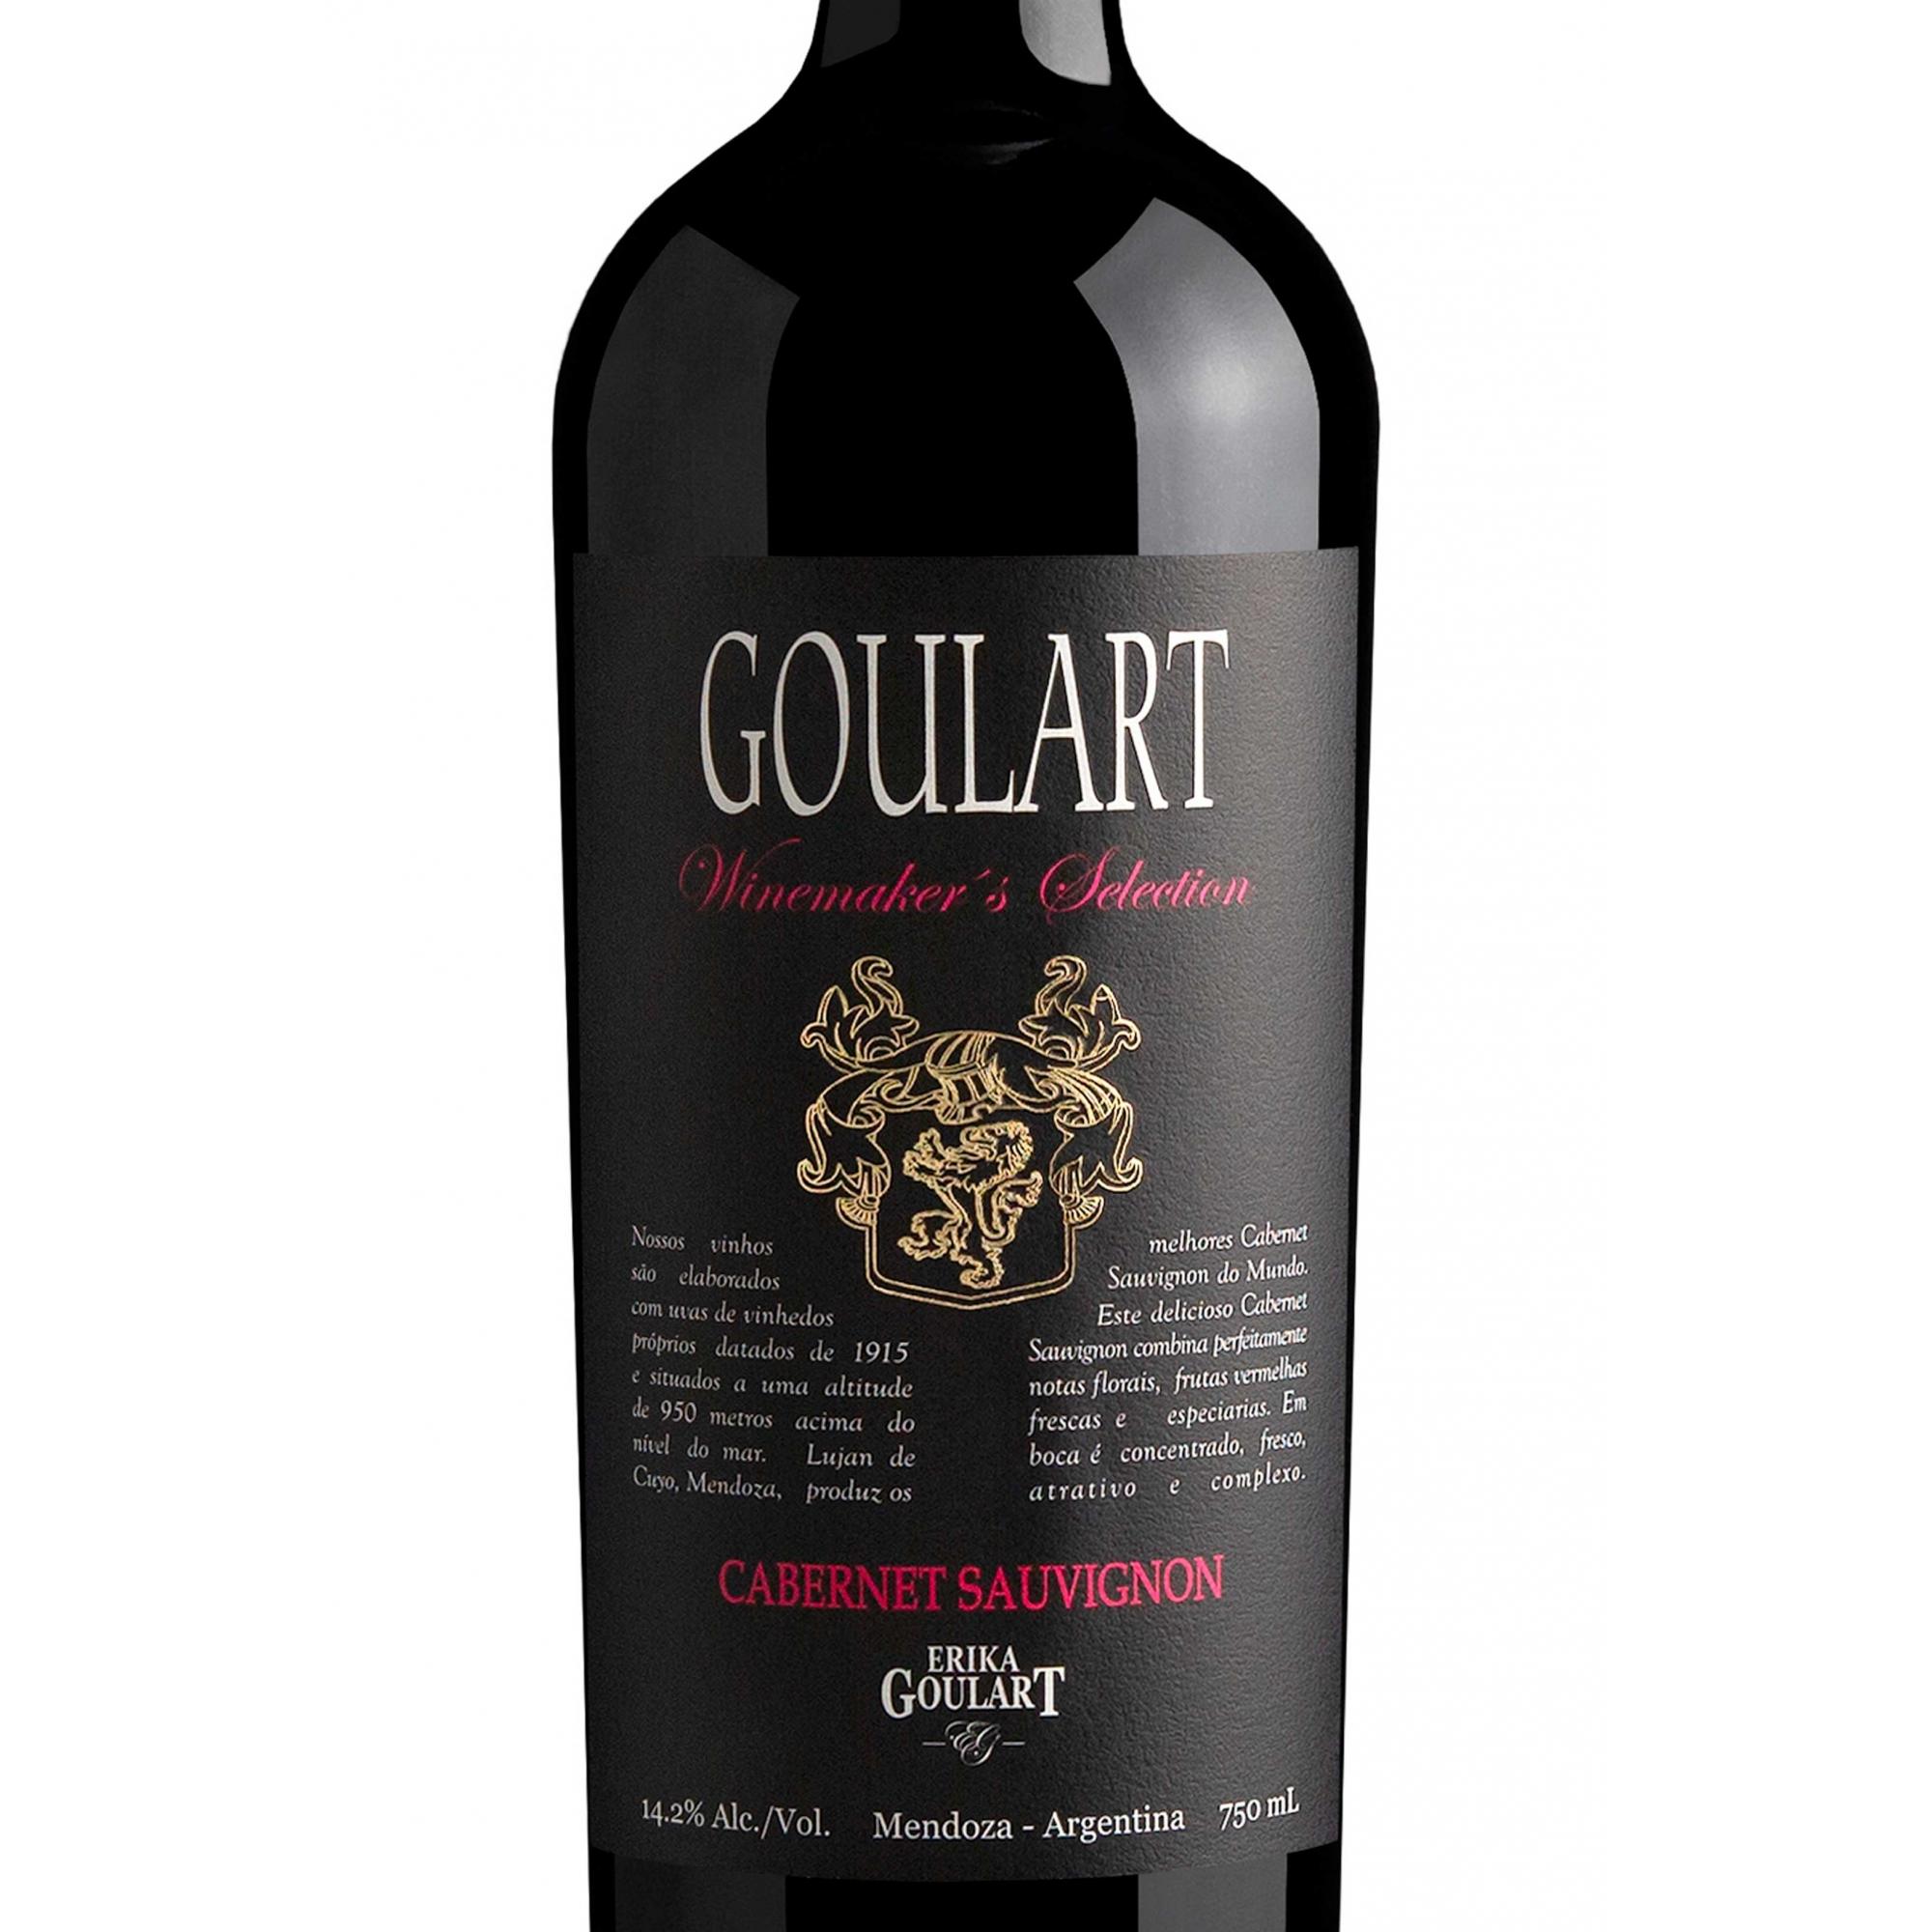 Goulart Winemaker's Selection Cabernet Sauvignon 2018 - 750ml